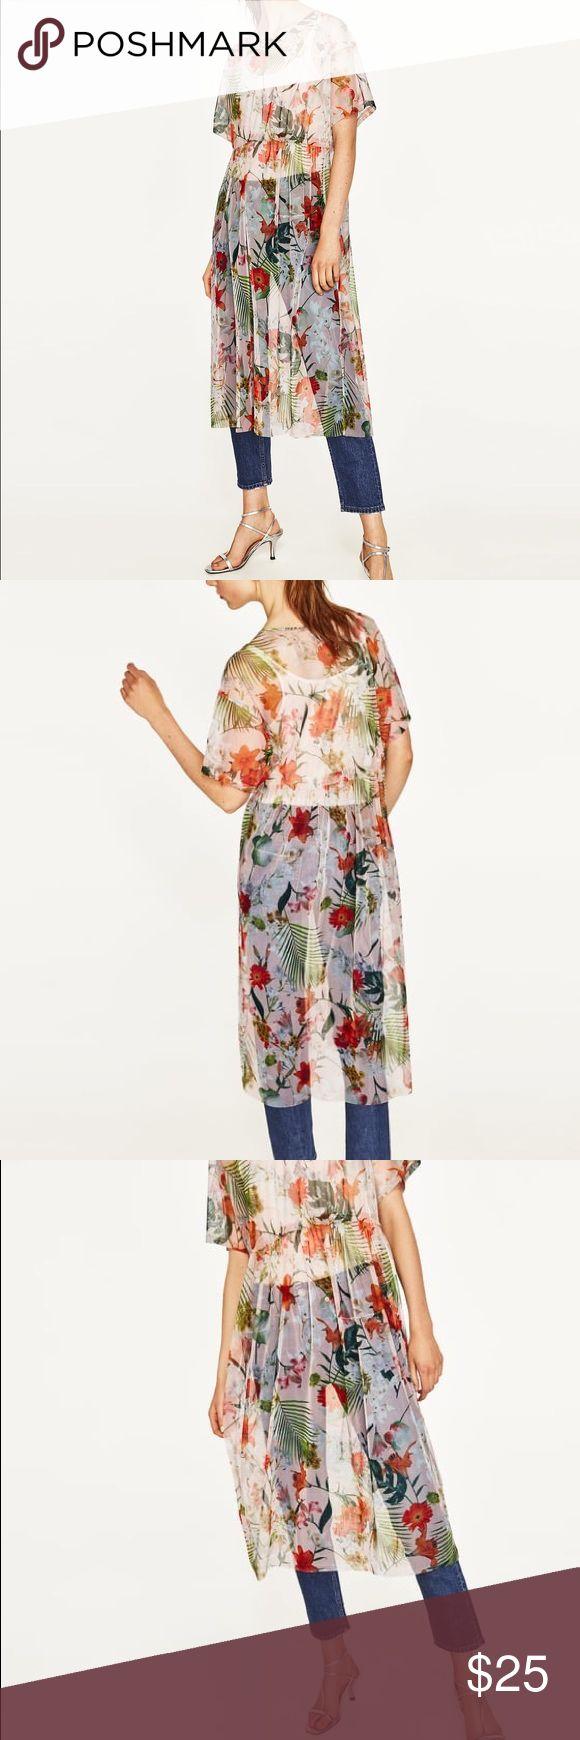 I just added this listing on Poshmark: Zara Long Tule T-shirt with floral print. #shopmycloset #poshmark #fashion #shopping #style #forsale #Zara #Tops